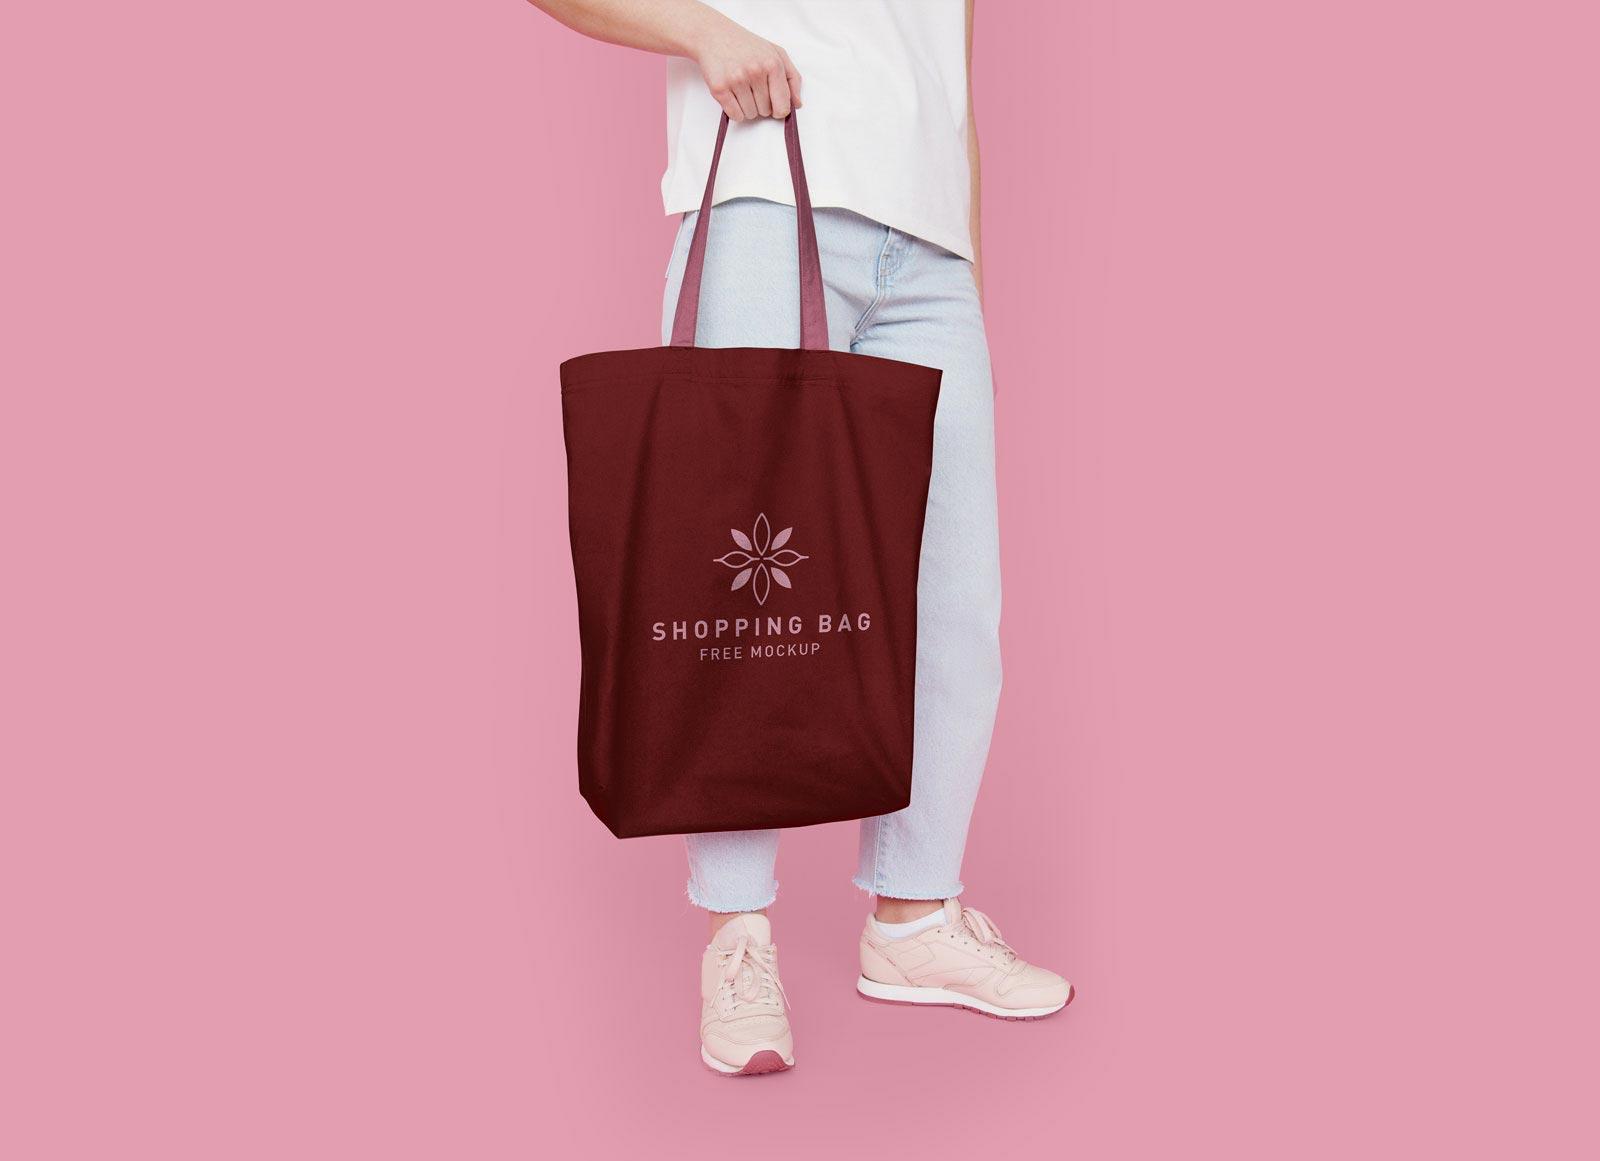 Free-Eco-Friendly-Cotton-Shopping-Bag-Mockup-PSD